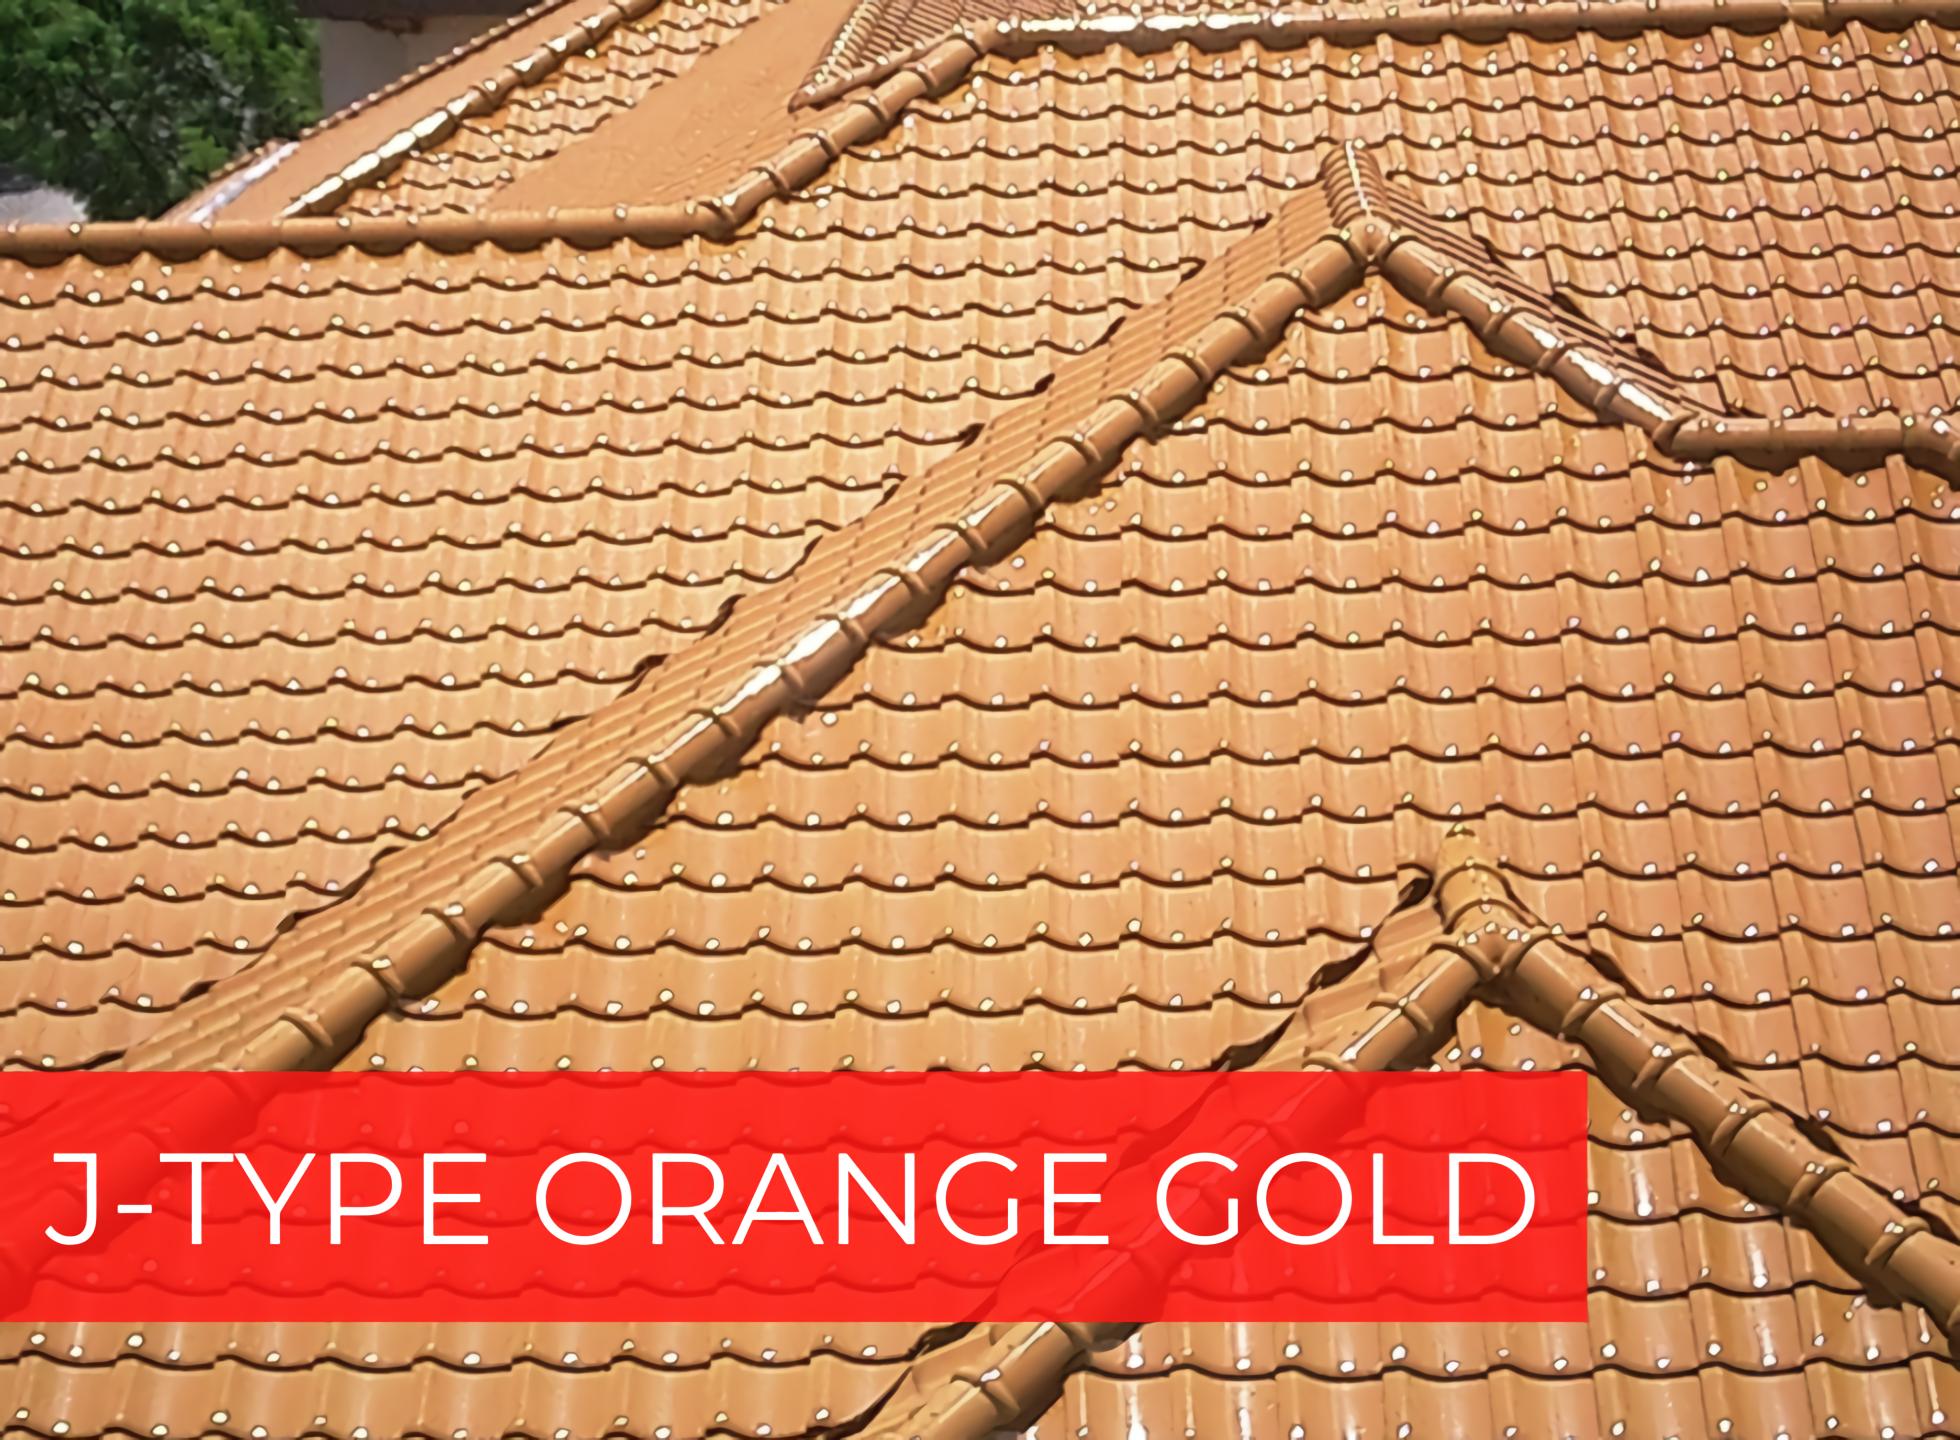 J-TYPE ORANGE GOLD photo